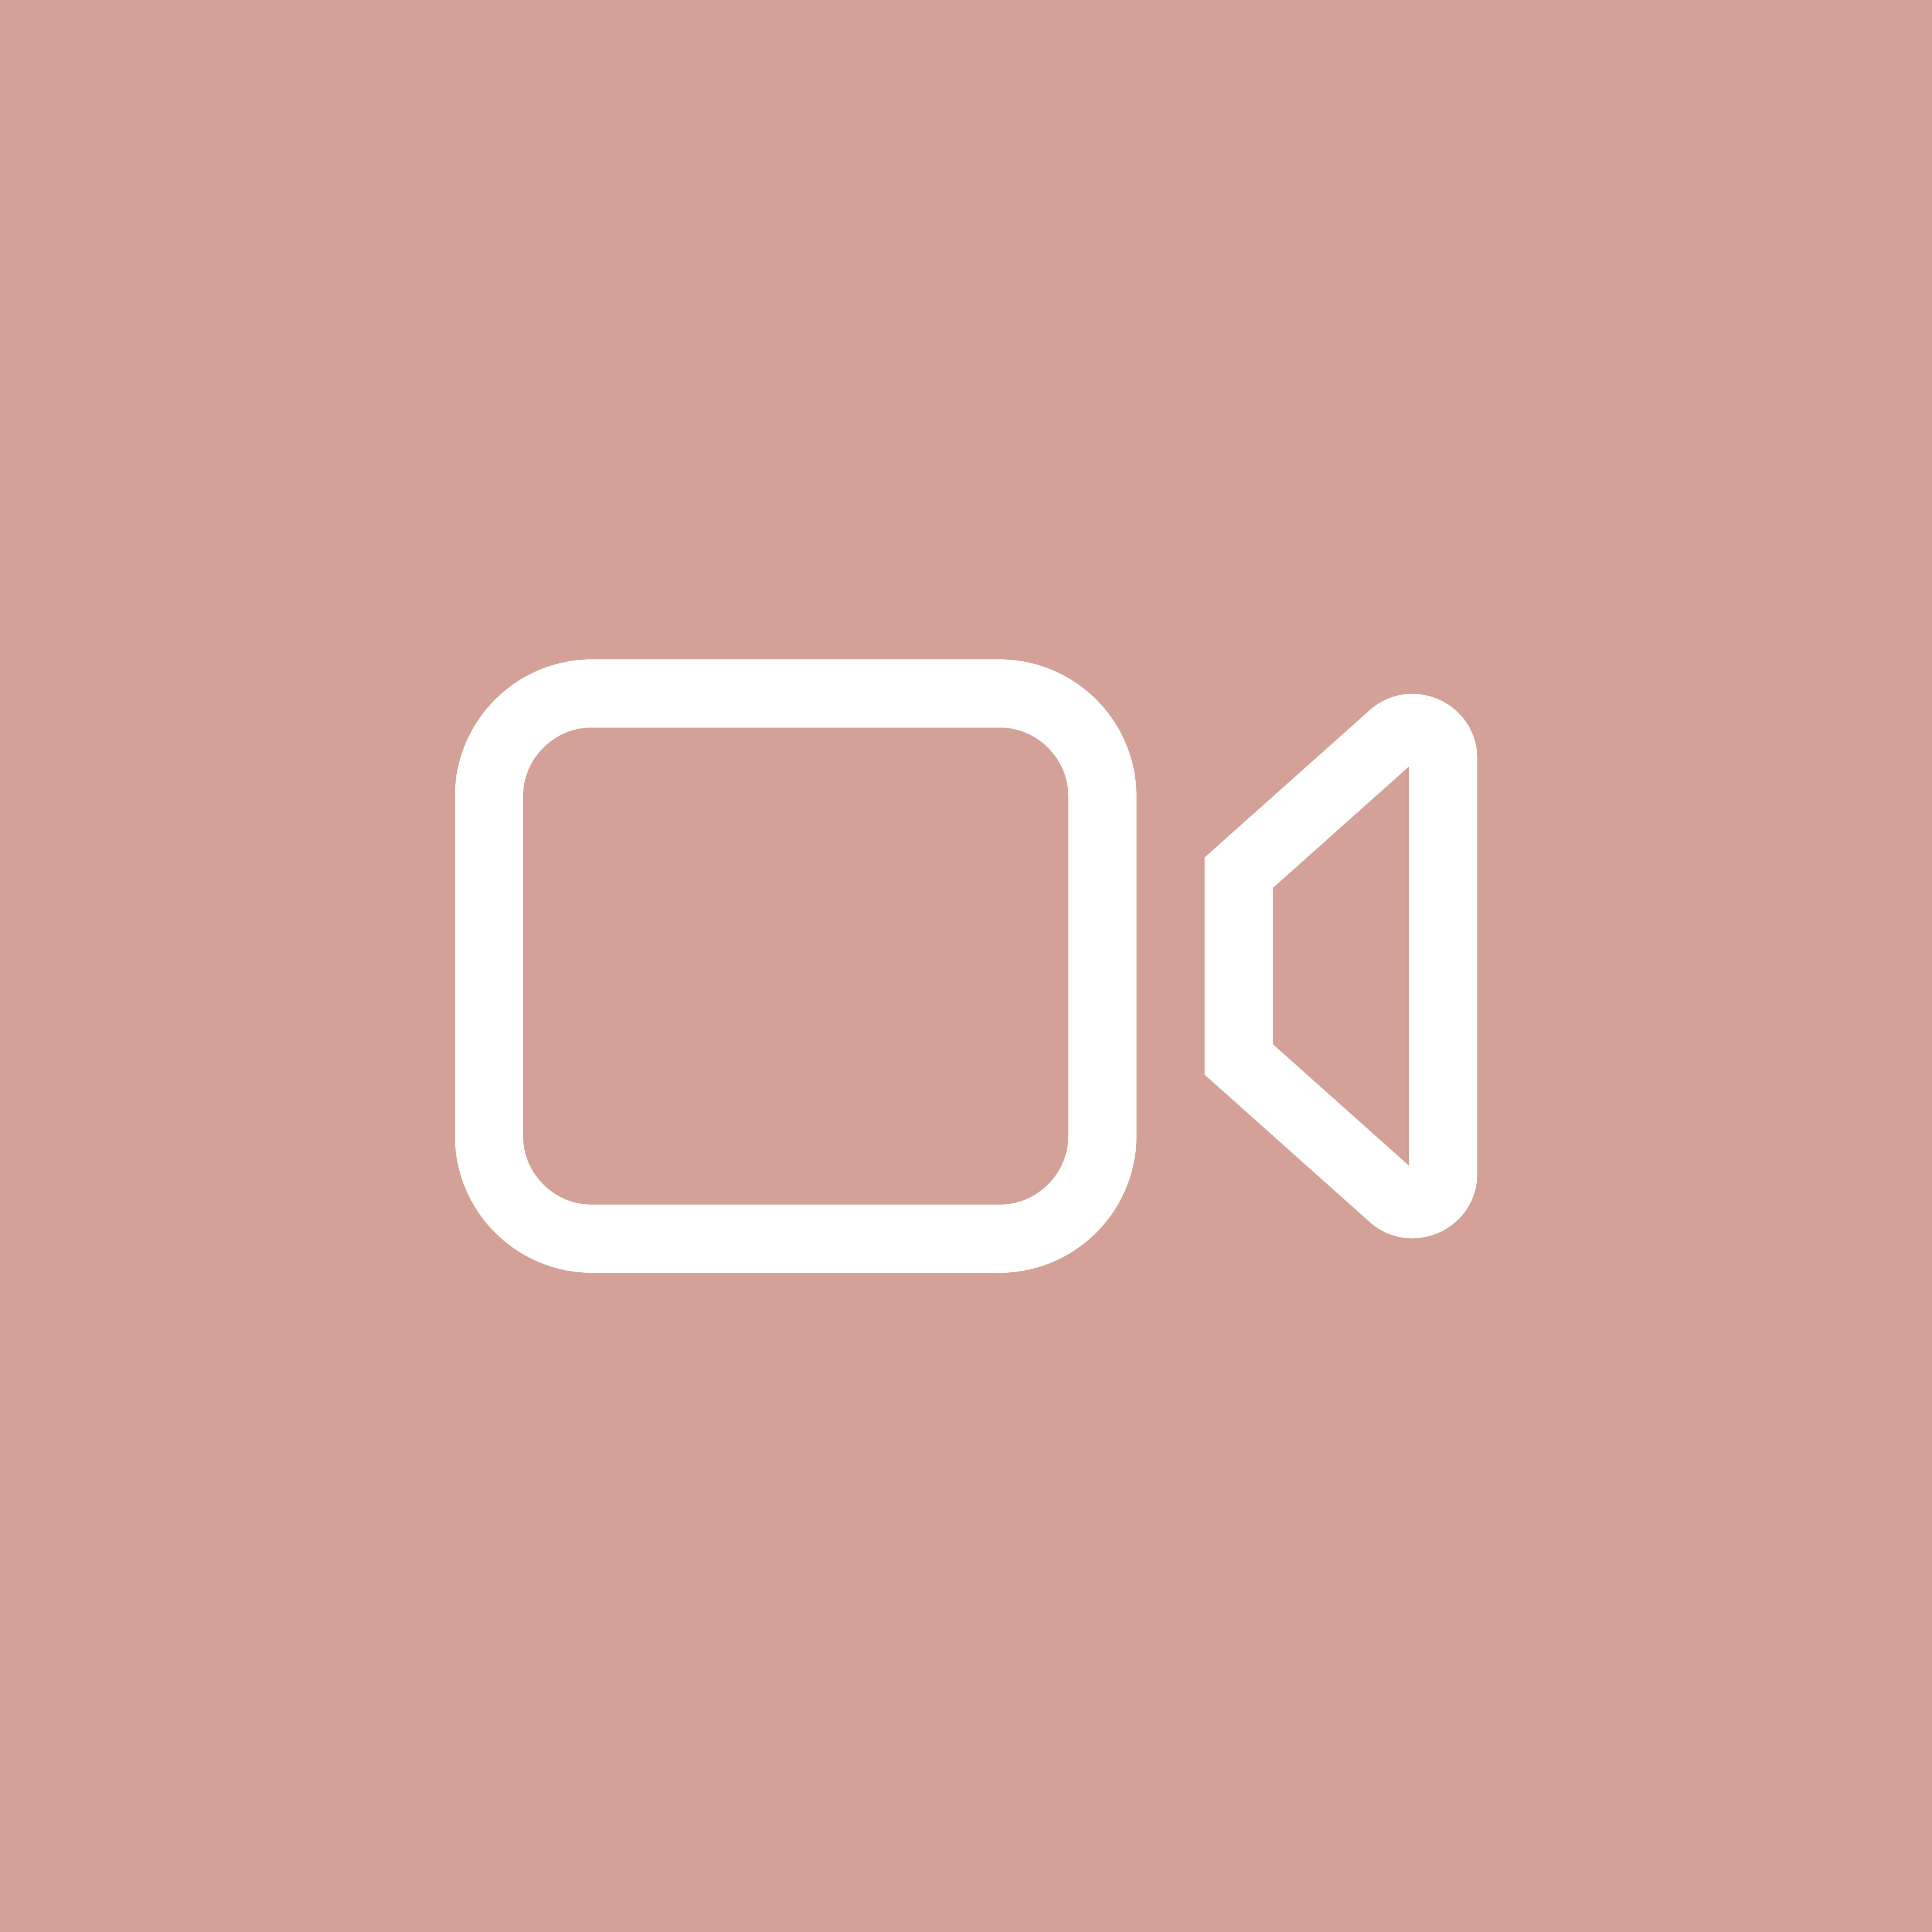 Pin Op App Icon Pink Tiktok pink icon in 2020 | iphone wallpaper app, iphone. pinterest